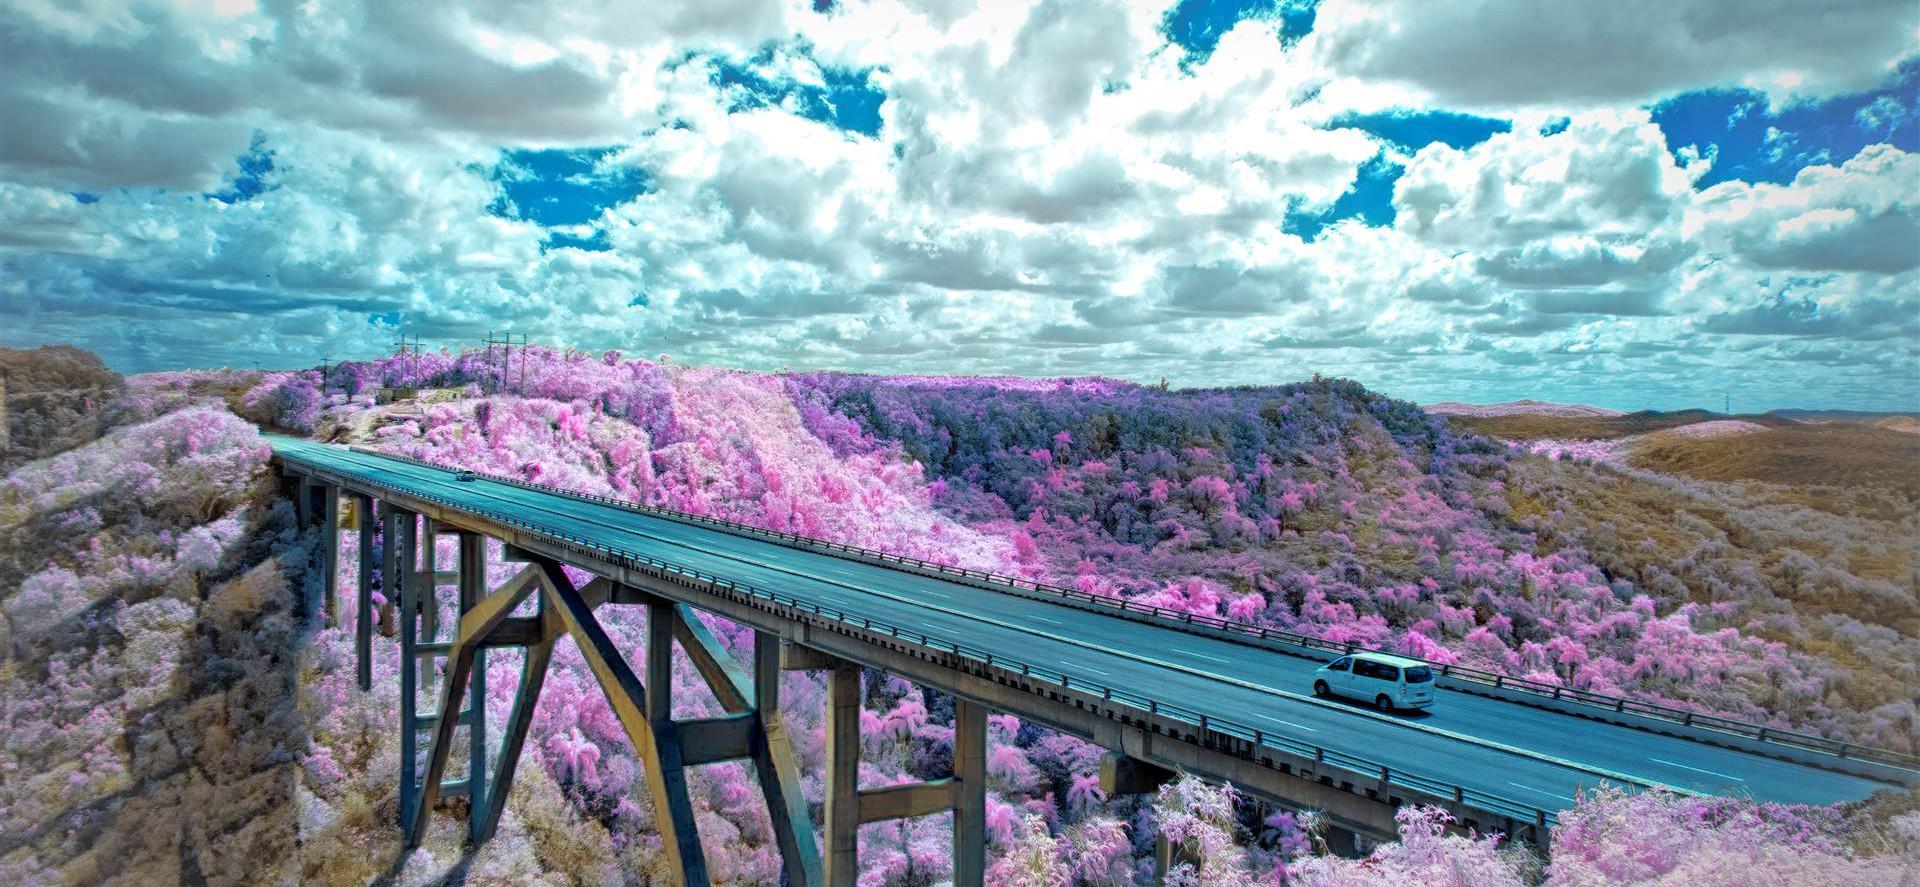 Bridging Reality by Donna Oglesby